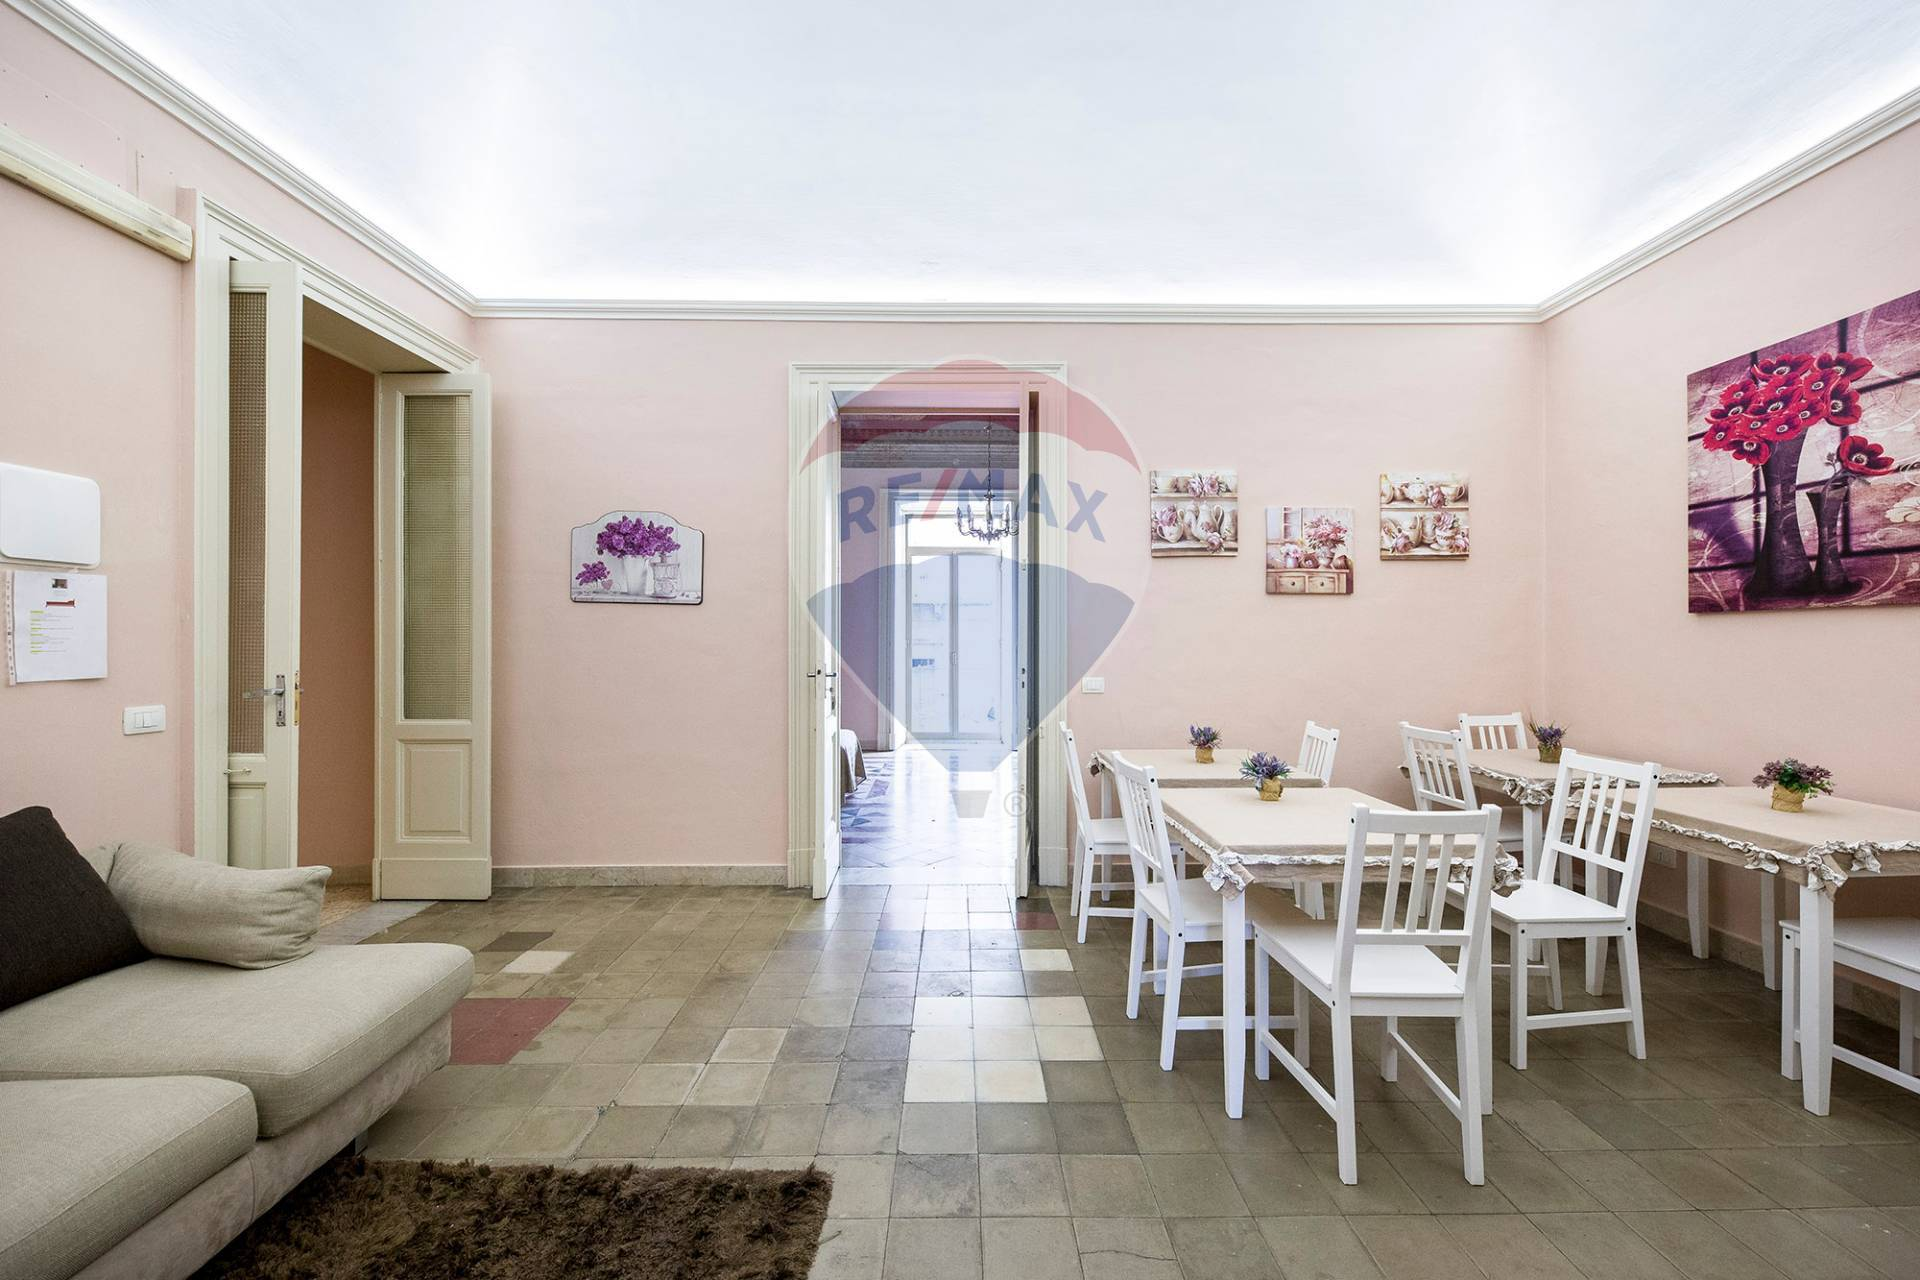 catania vendita quart: centro storico,garibaldi,vittorio emanuele re/max city home